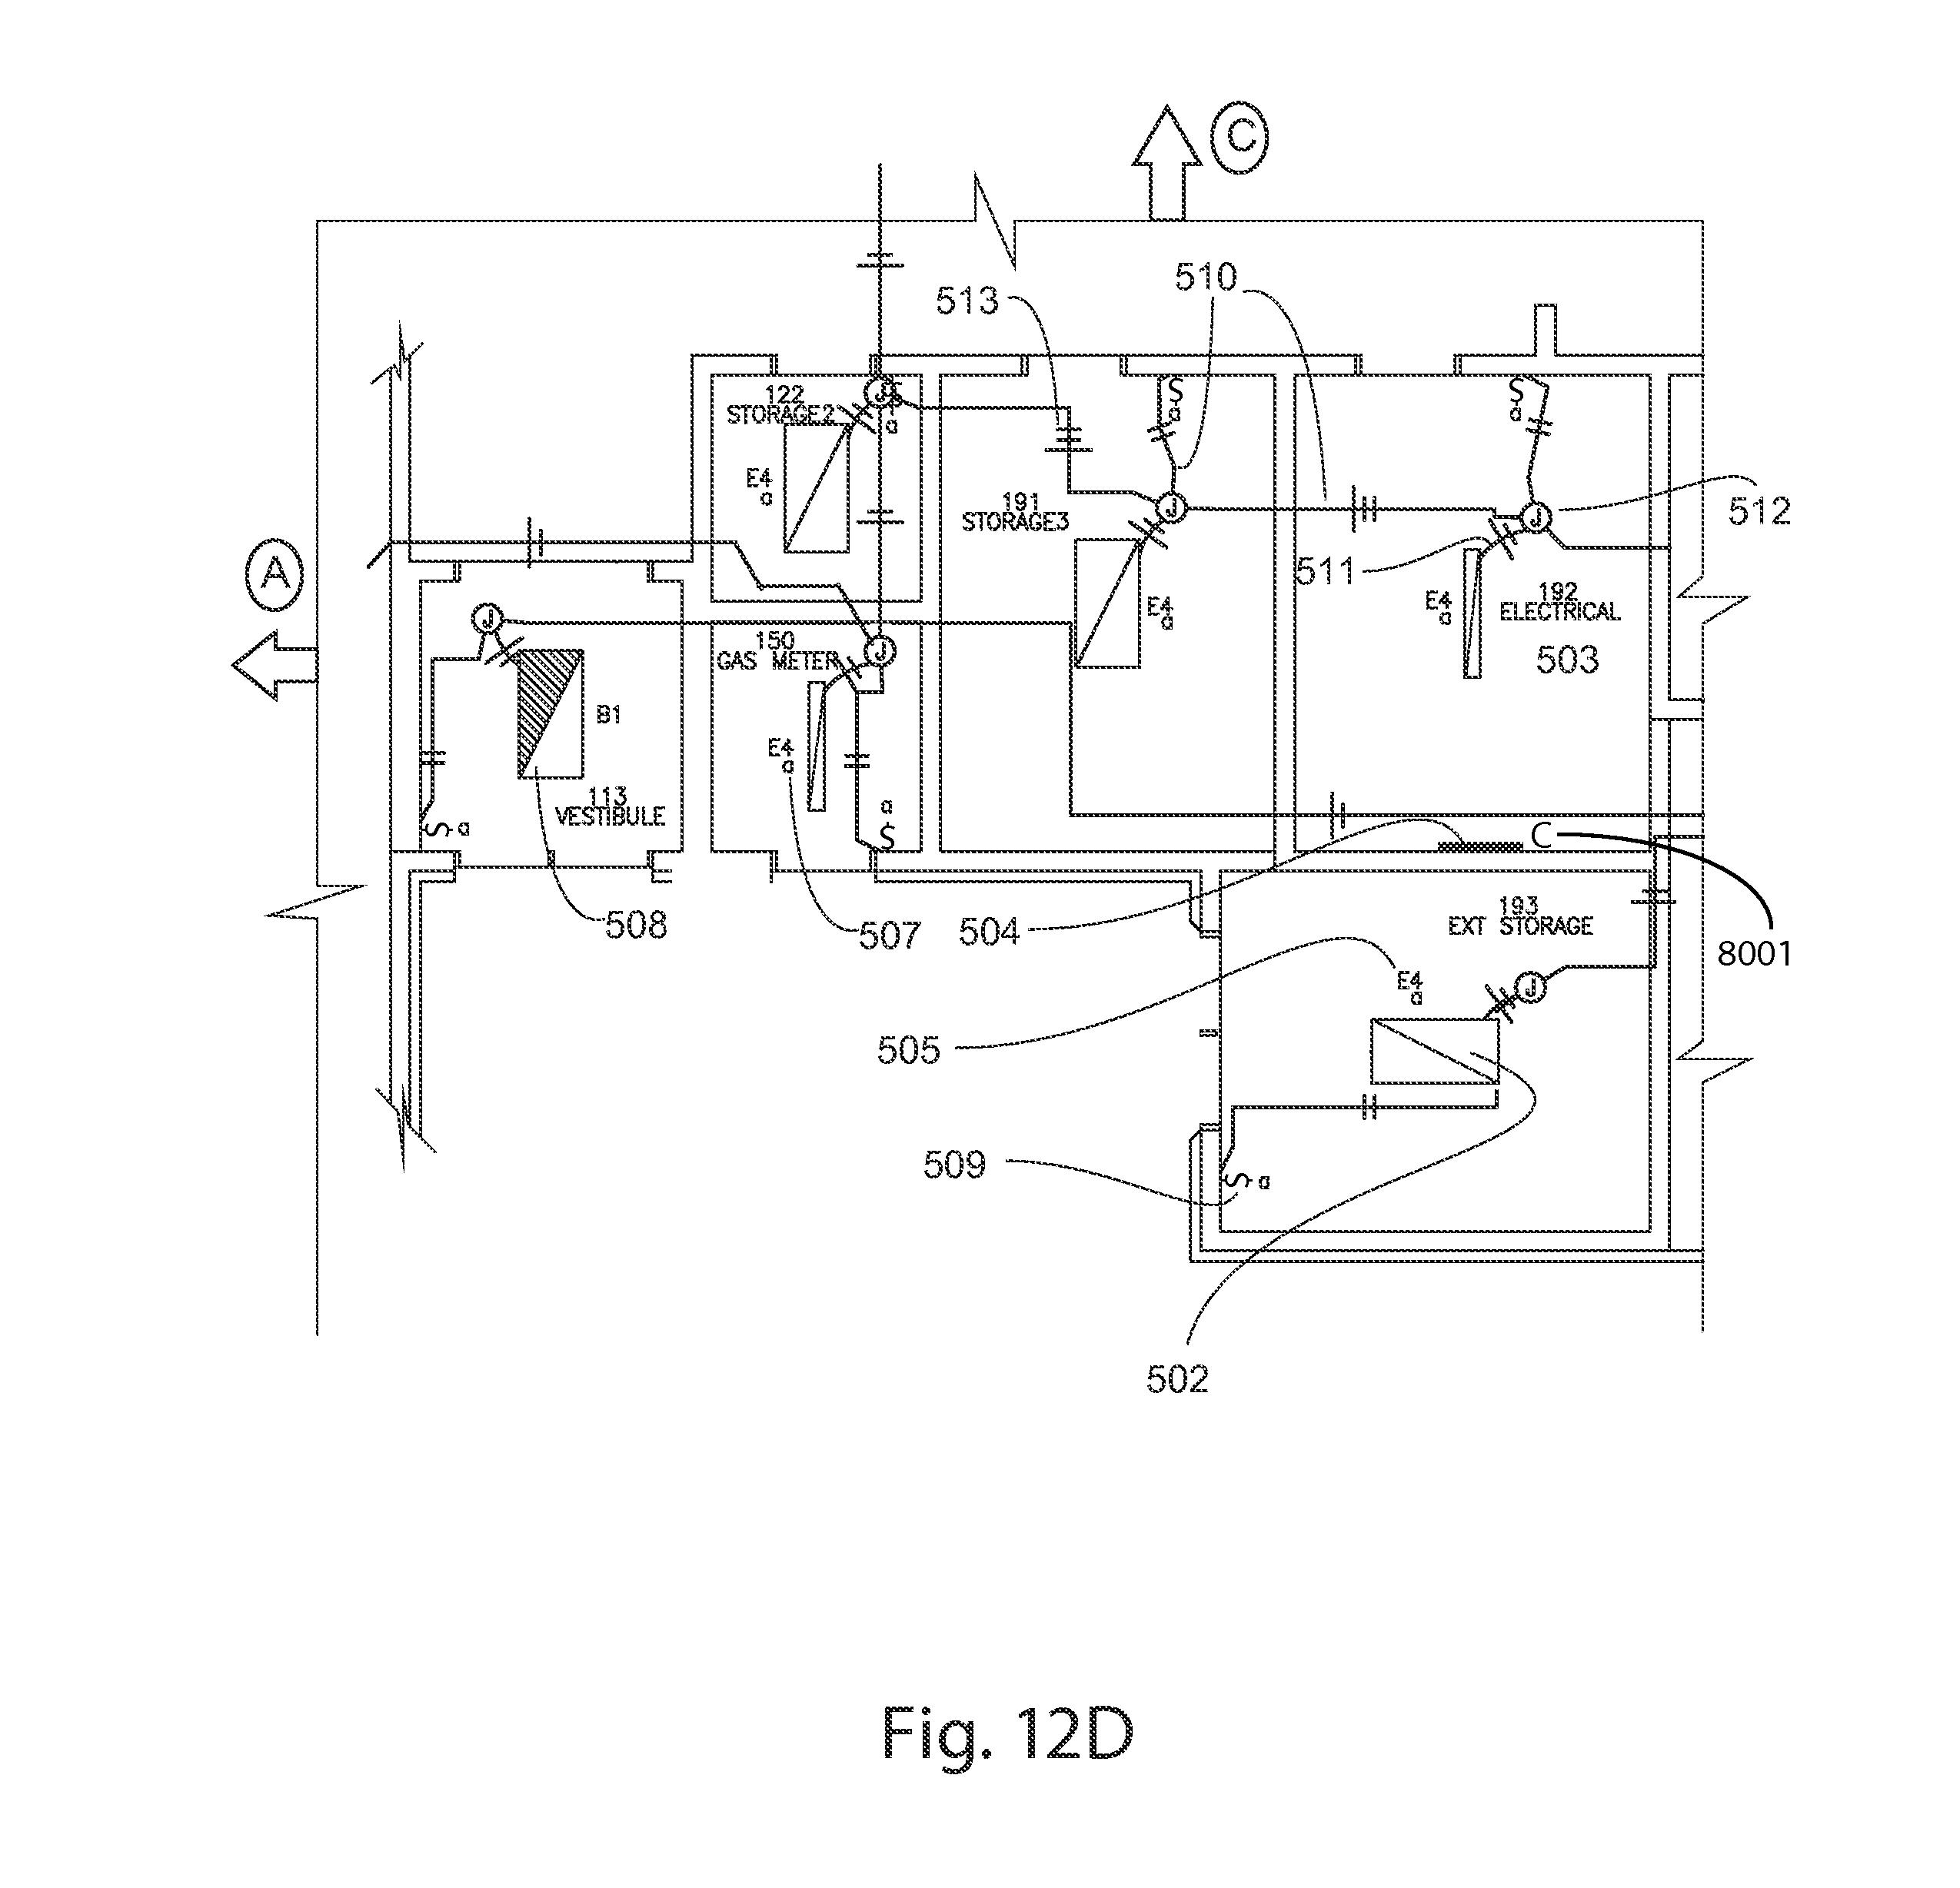 208v receptacle wiring diagram 208v image wiring showing post media for 208v receptacle electrical symbol on 208v receptacle wiring diagram